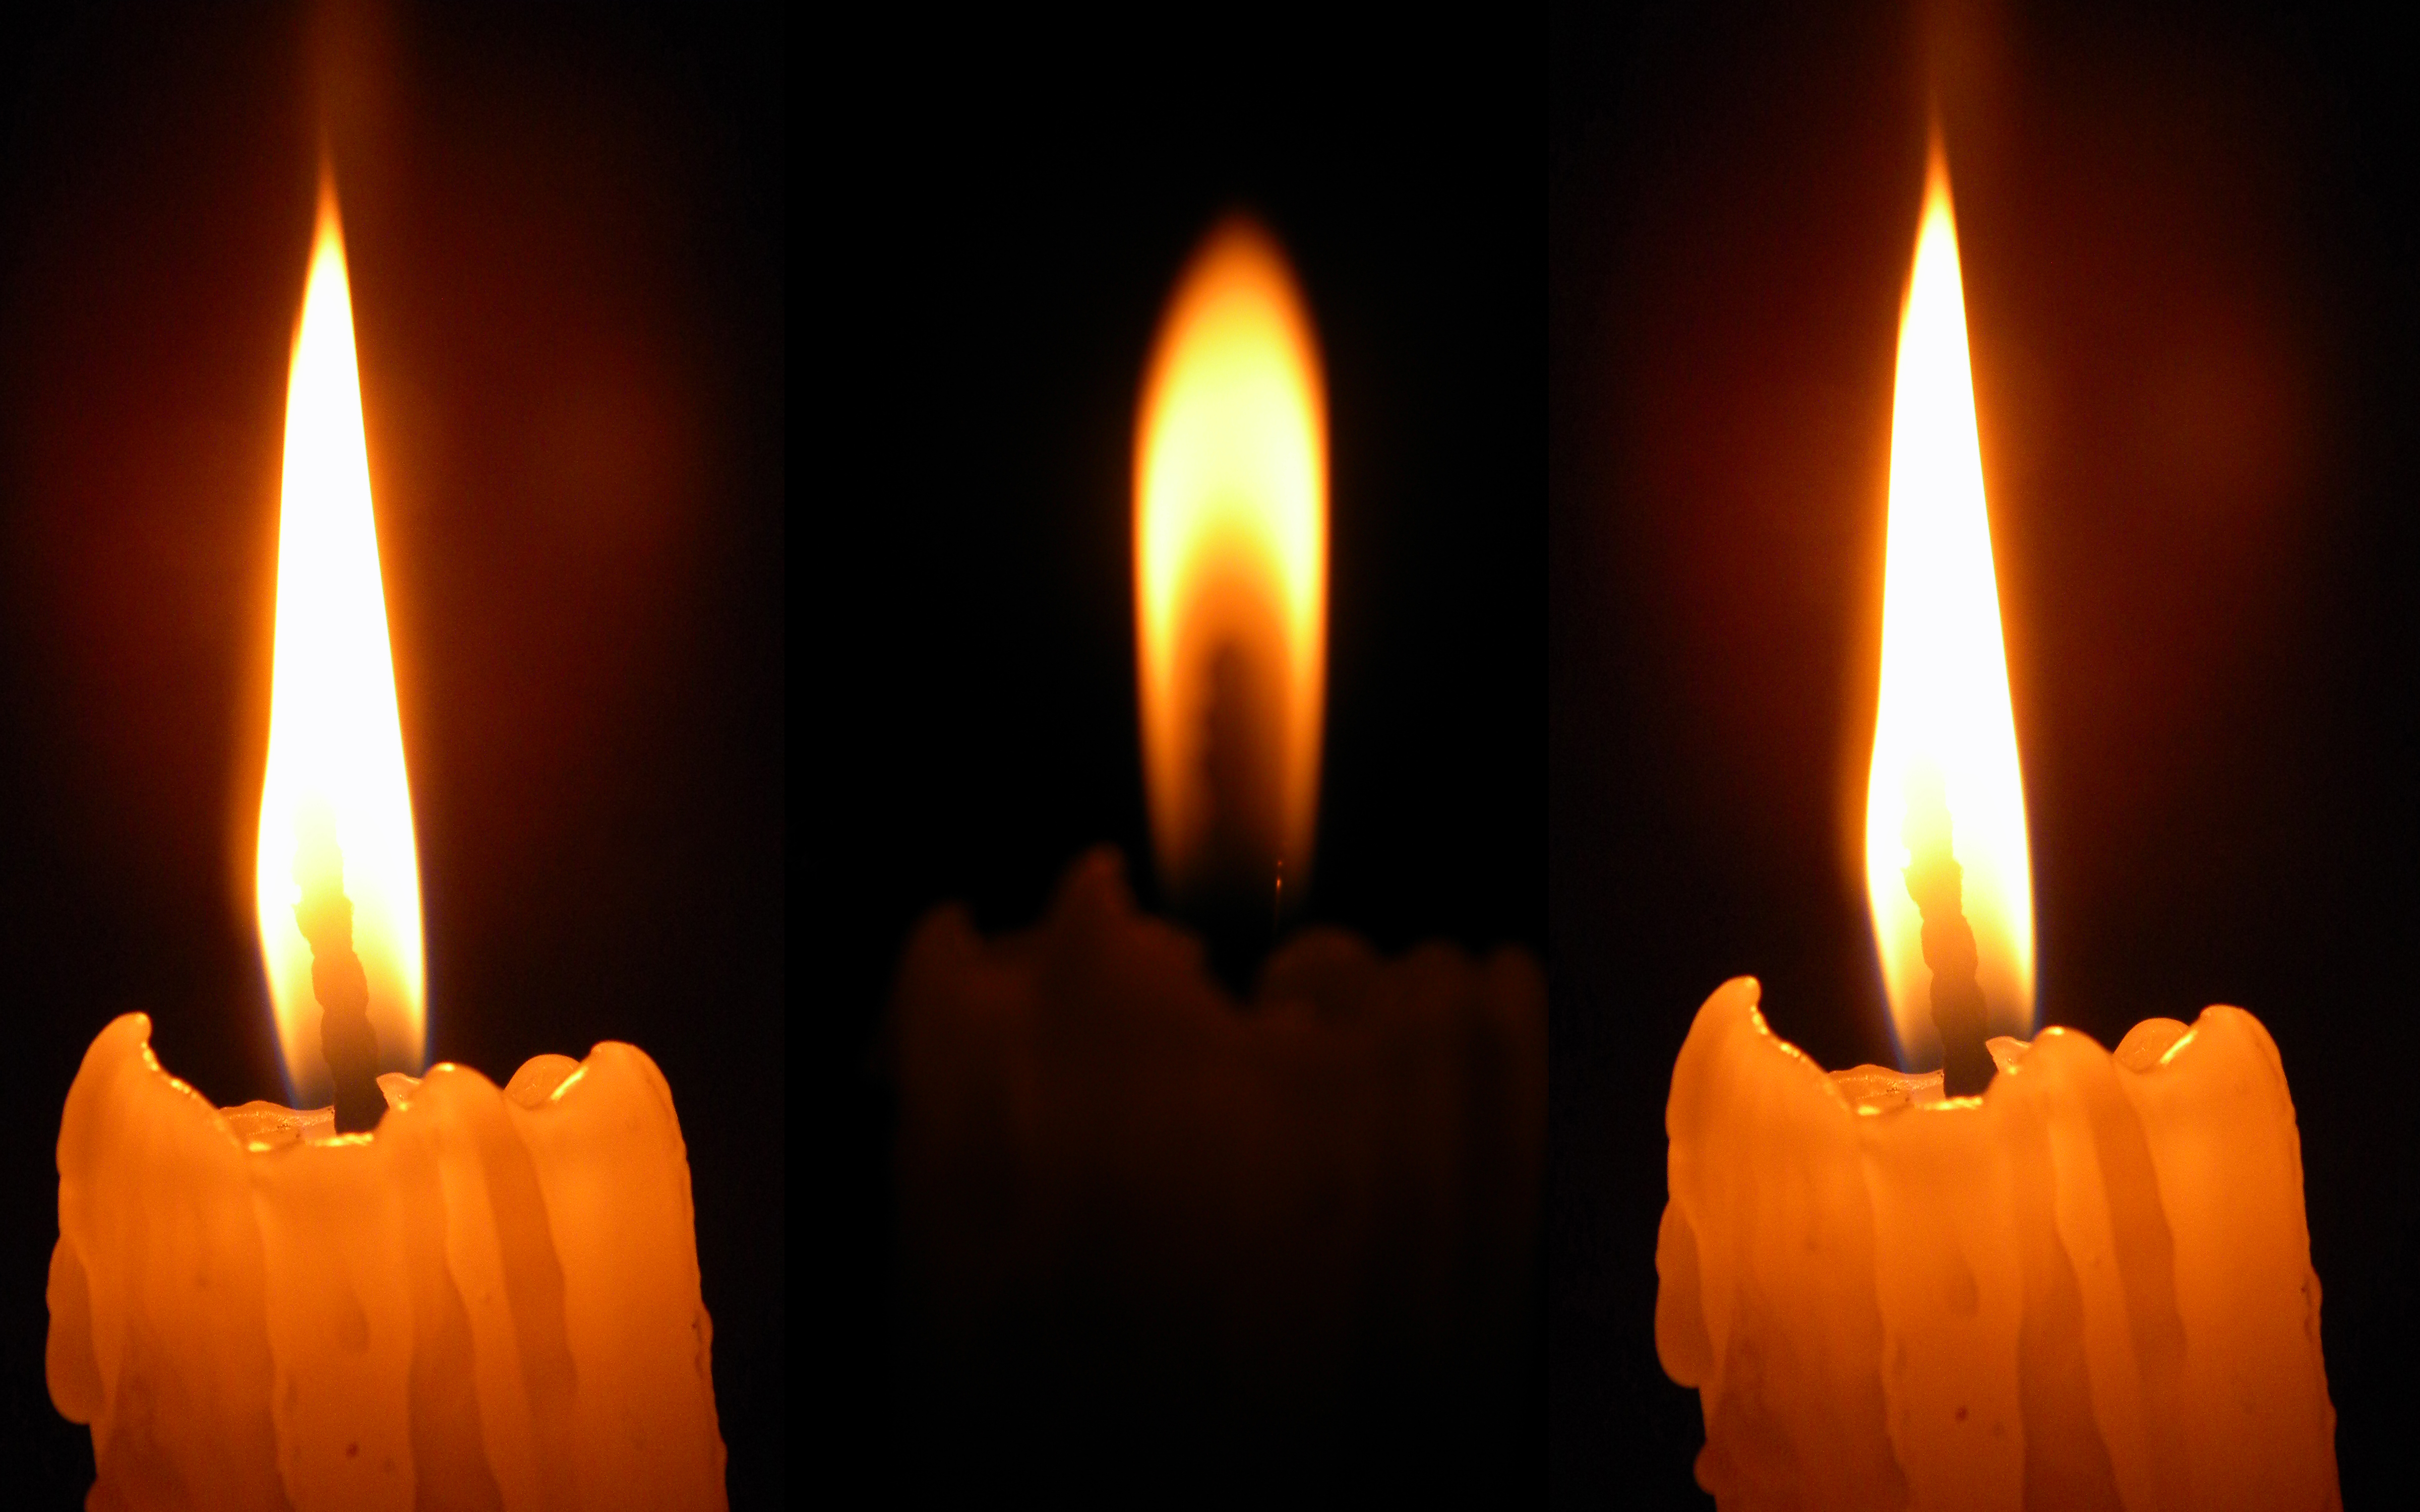 File:Flames in the dark.jpg - Wikimedia Commons